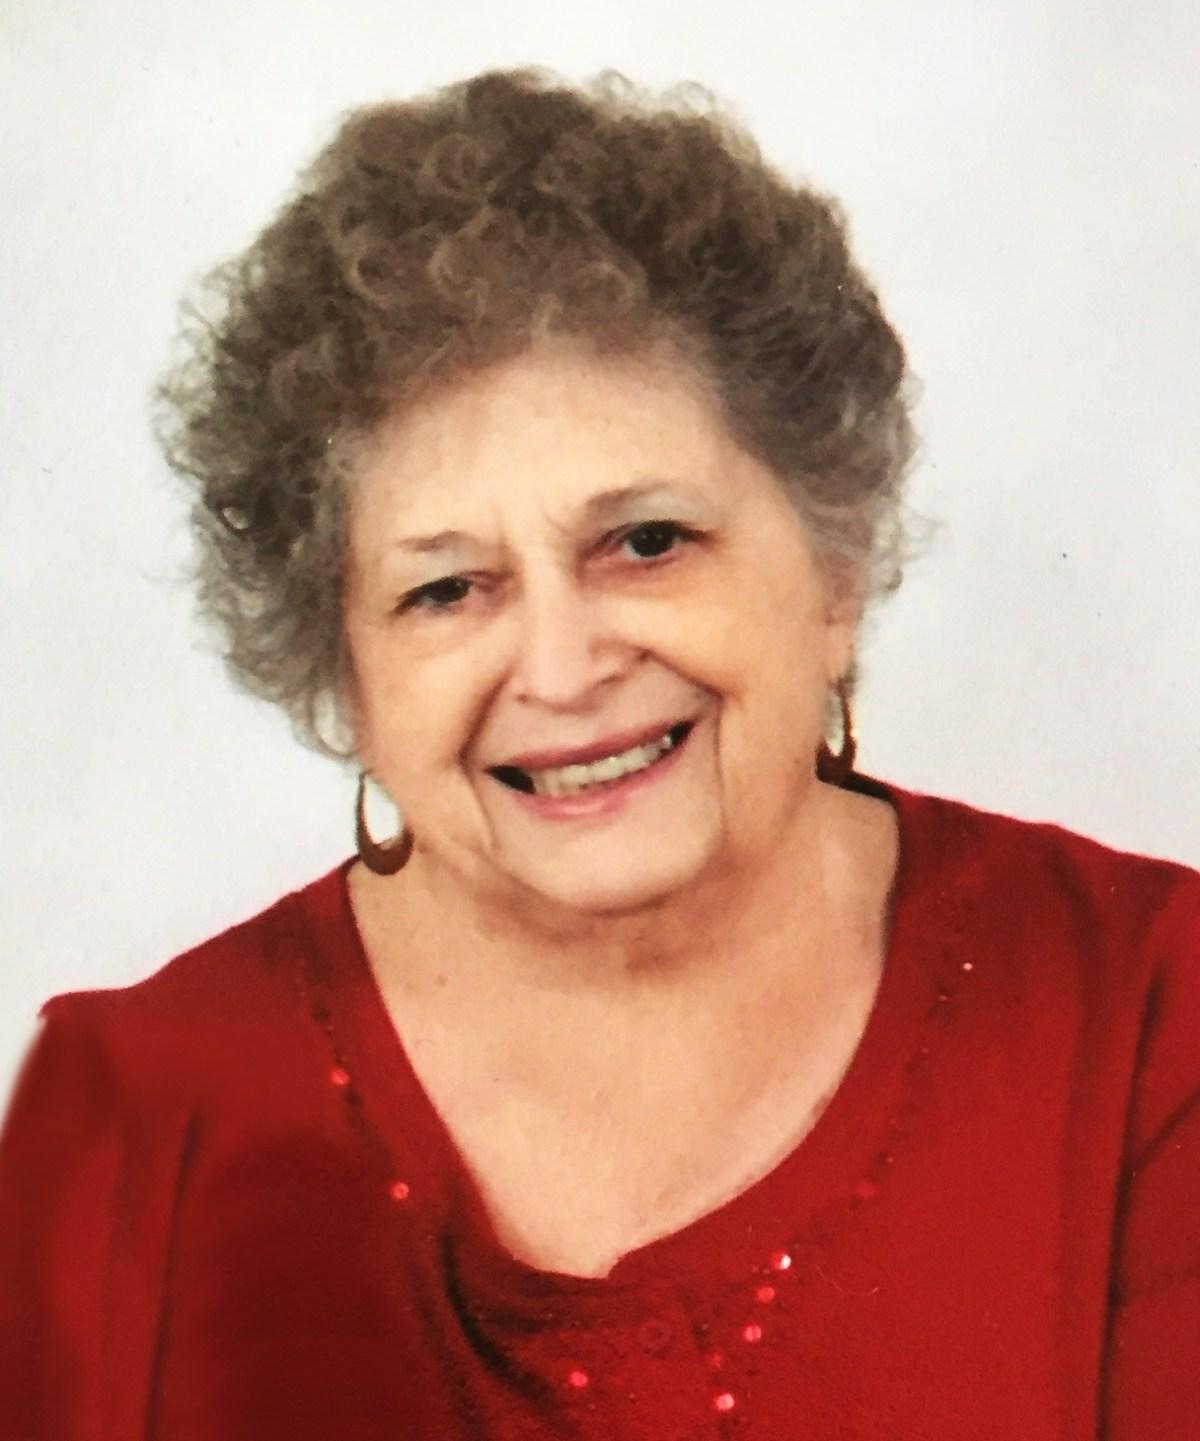 Rita Ress